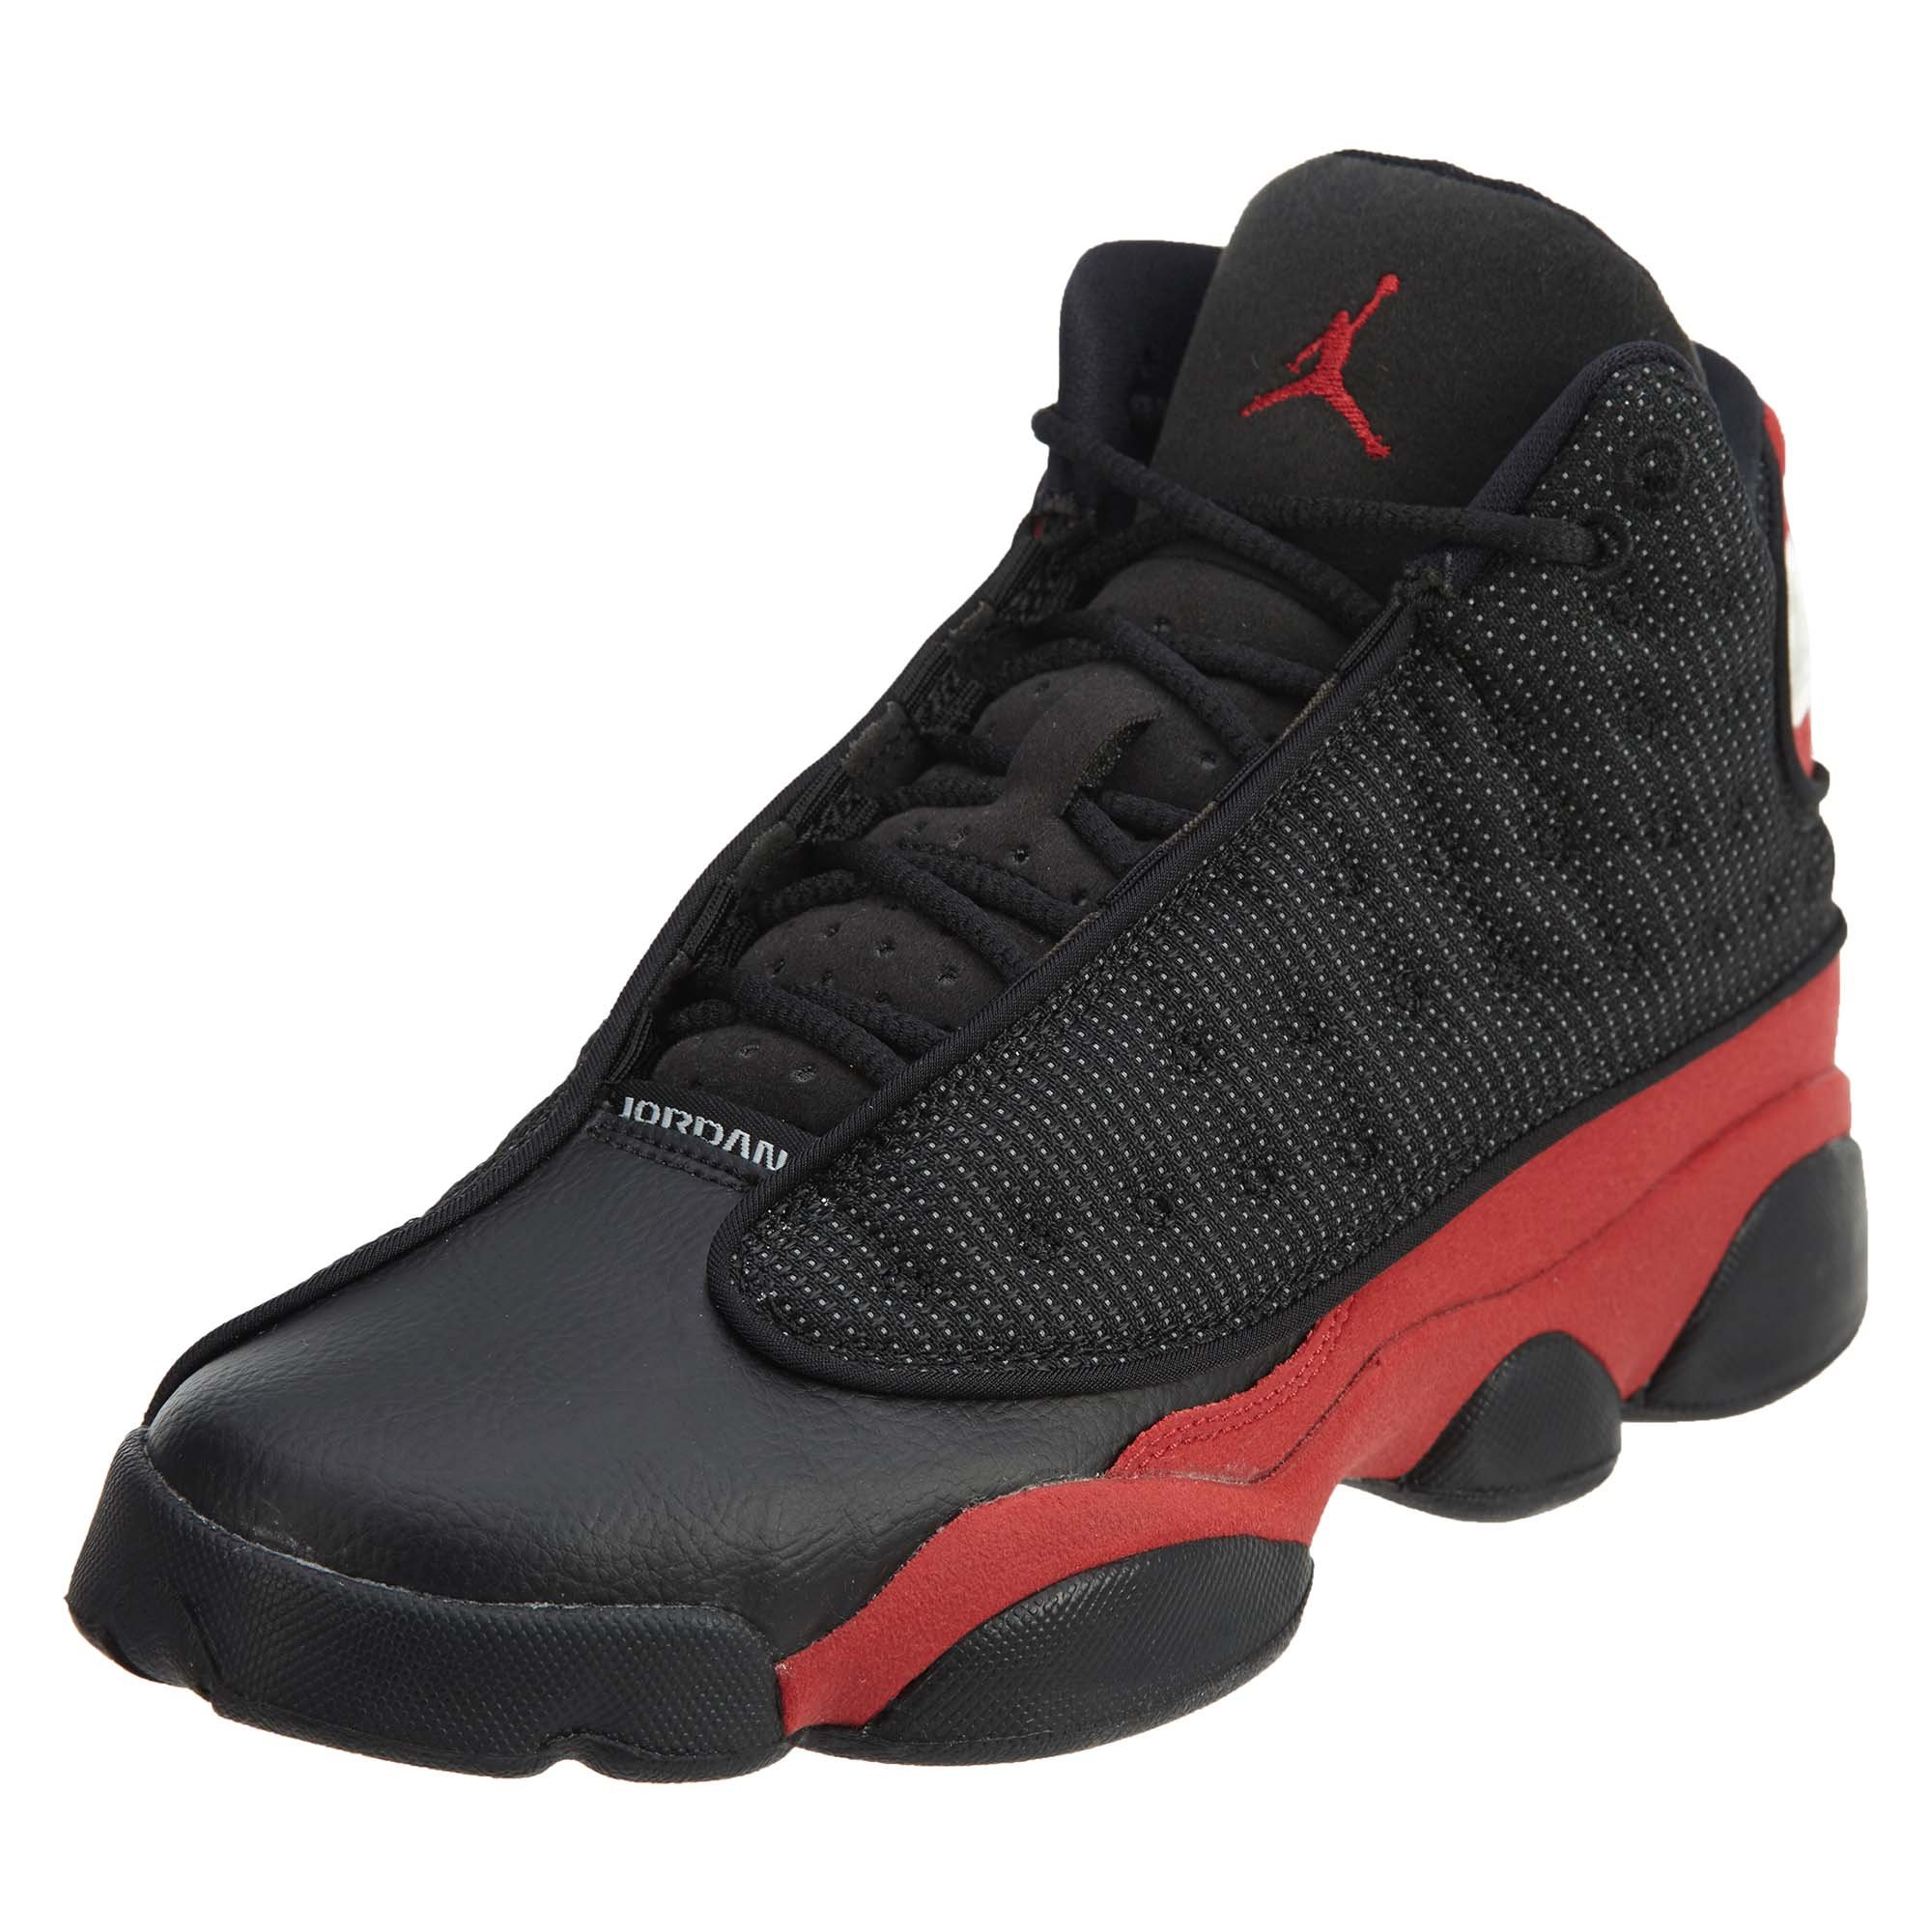 outlet store 46a74 e4058 Galleon - Air Jordan 13 Retro BG